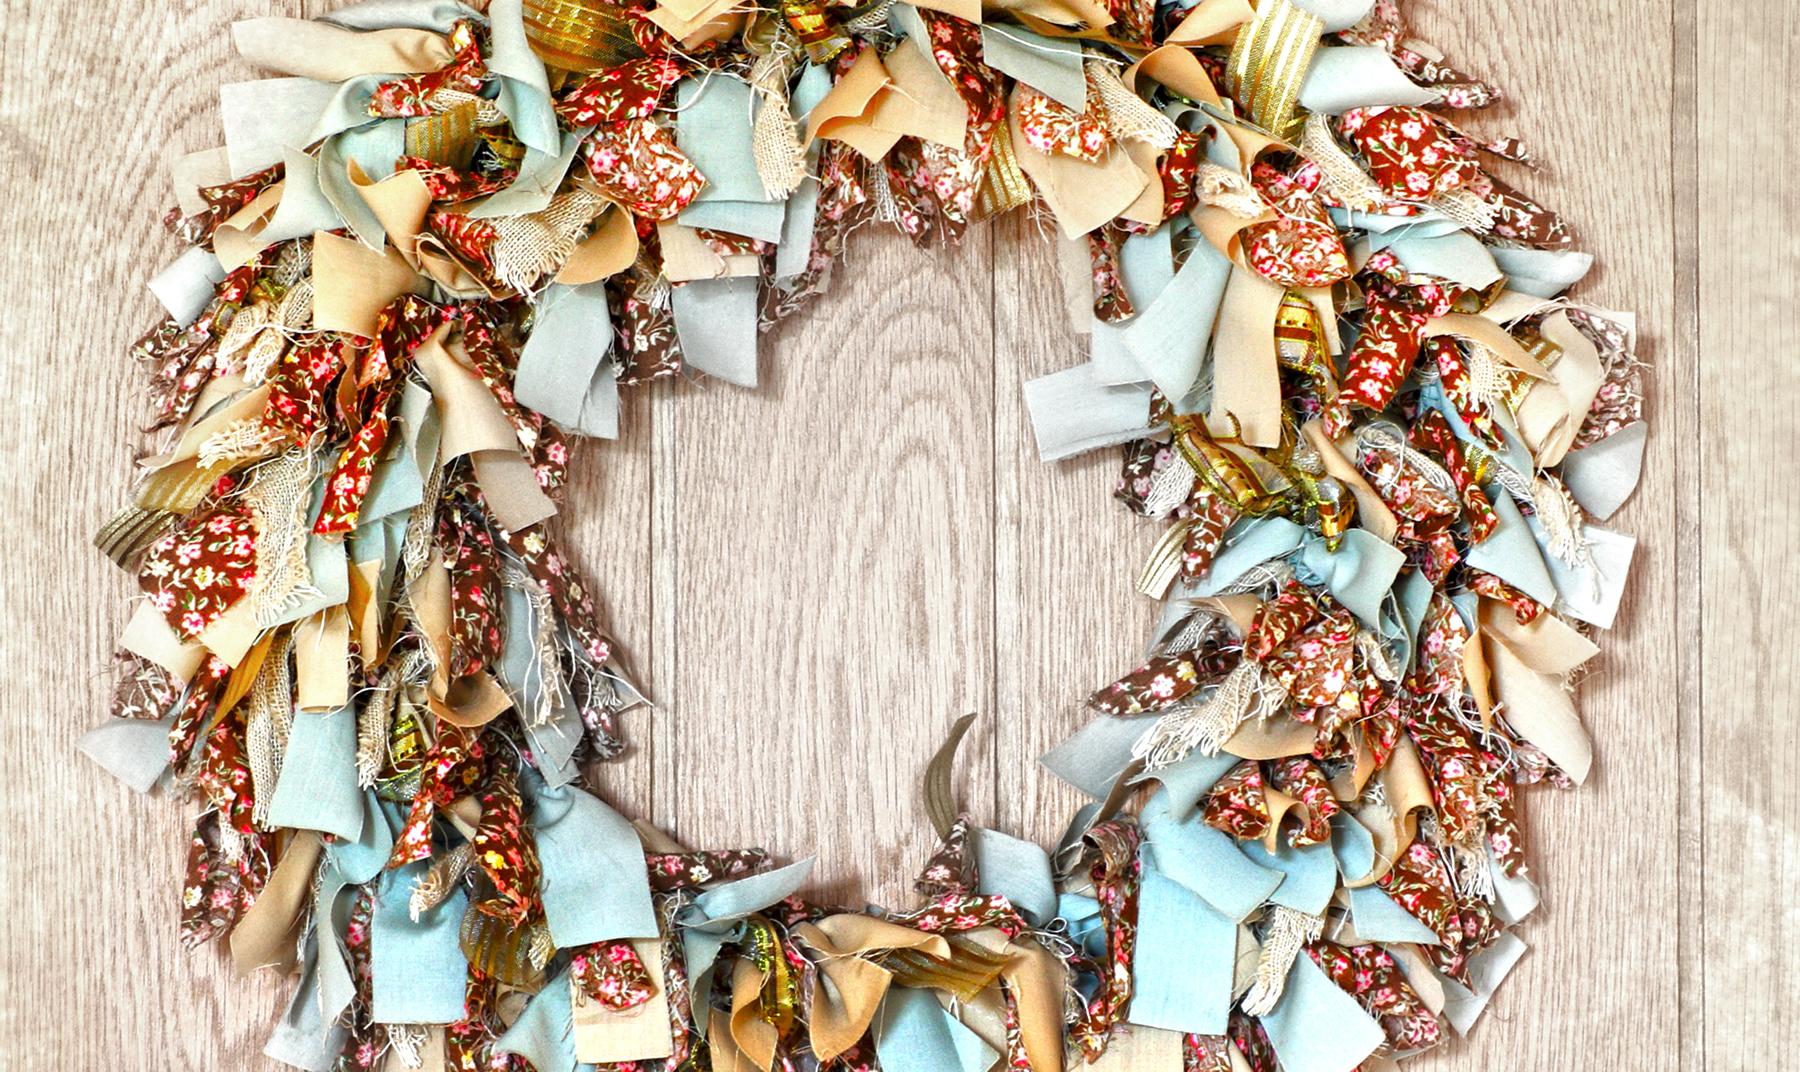 Make Your Own Christmas Wreath - Elmbridge Museum